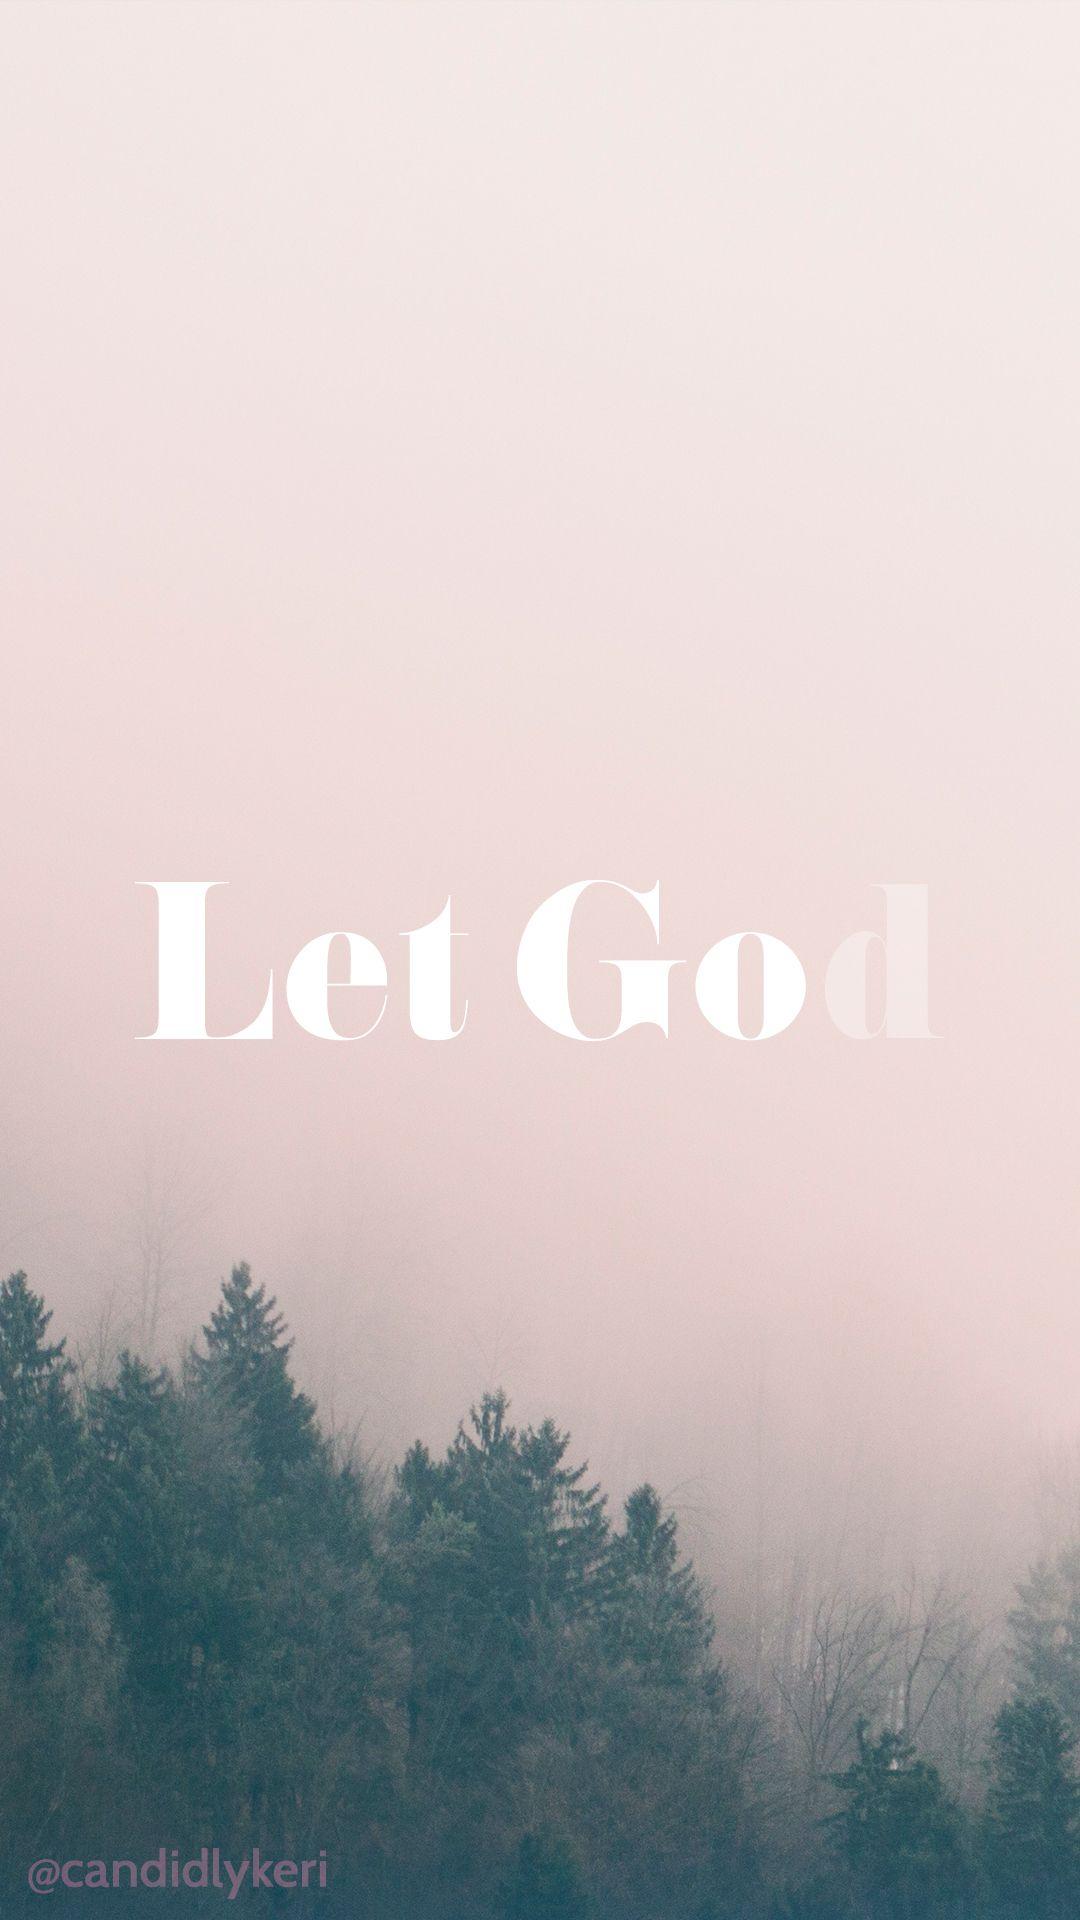 let go, let god iphone wallpaper | ❅ iphone wallpaper | scripture